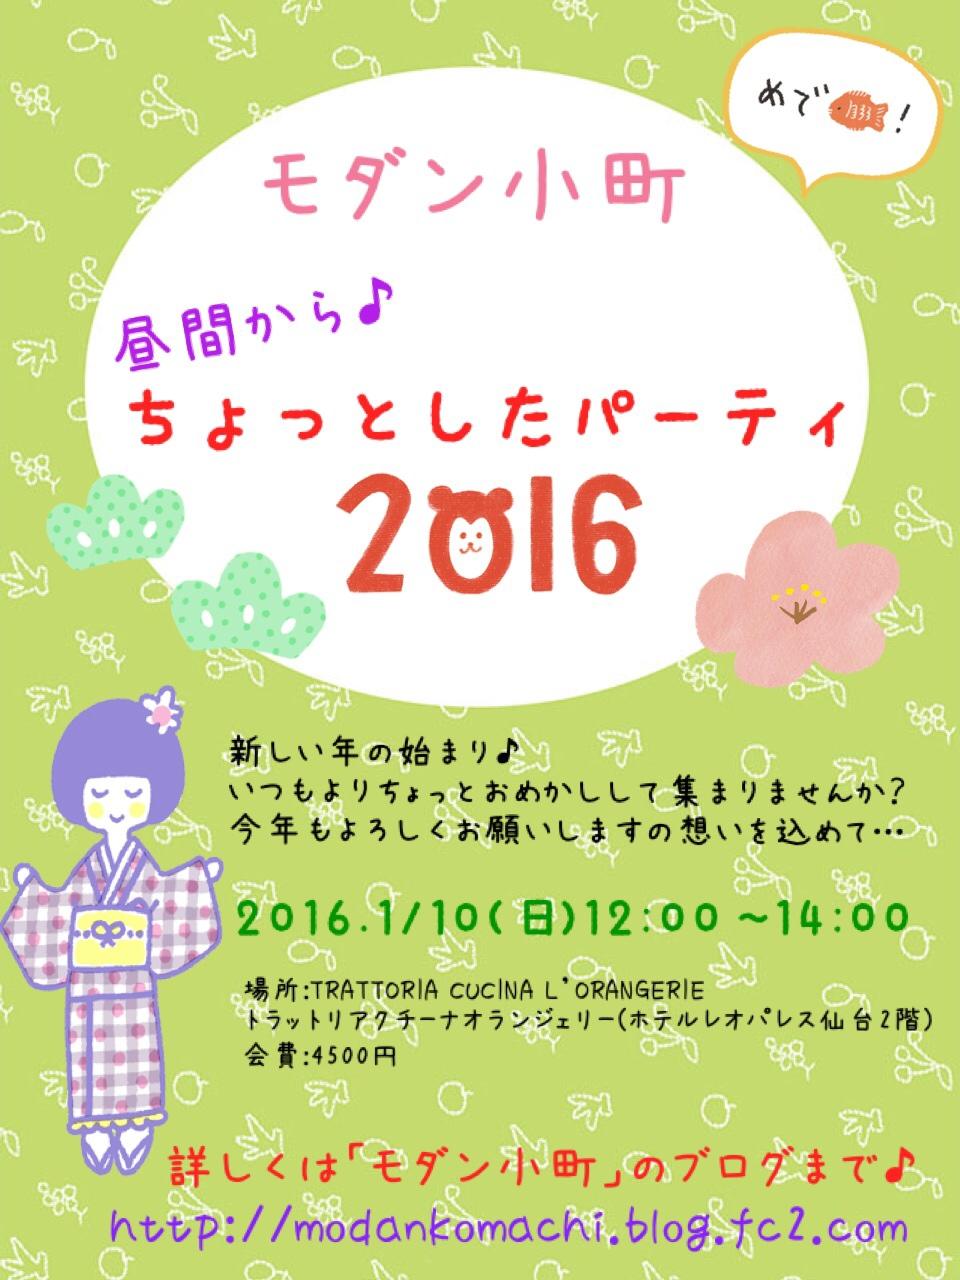 fc2blog_2015120812264643c.jpg